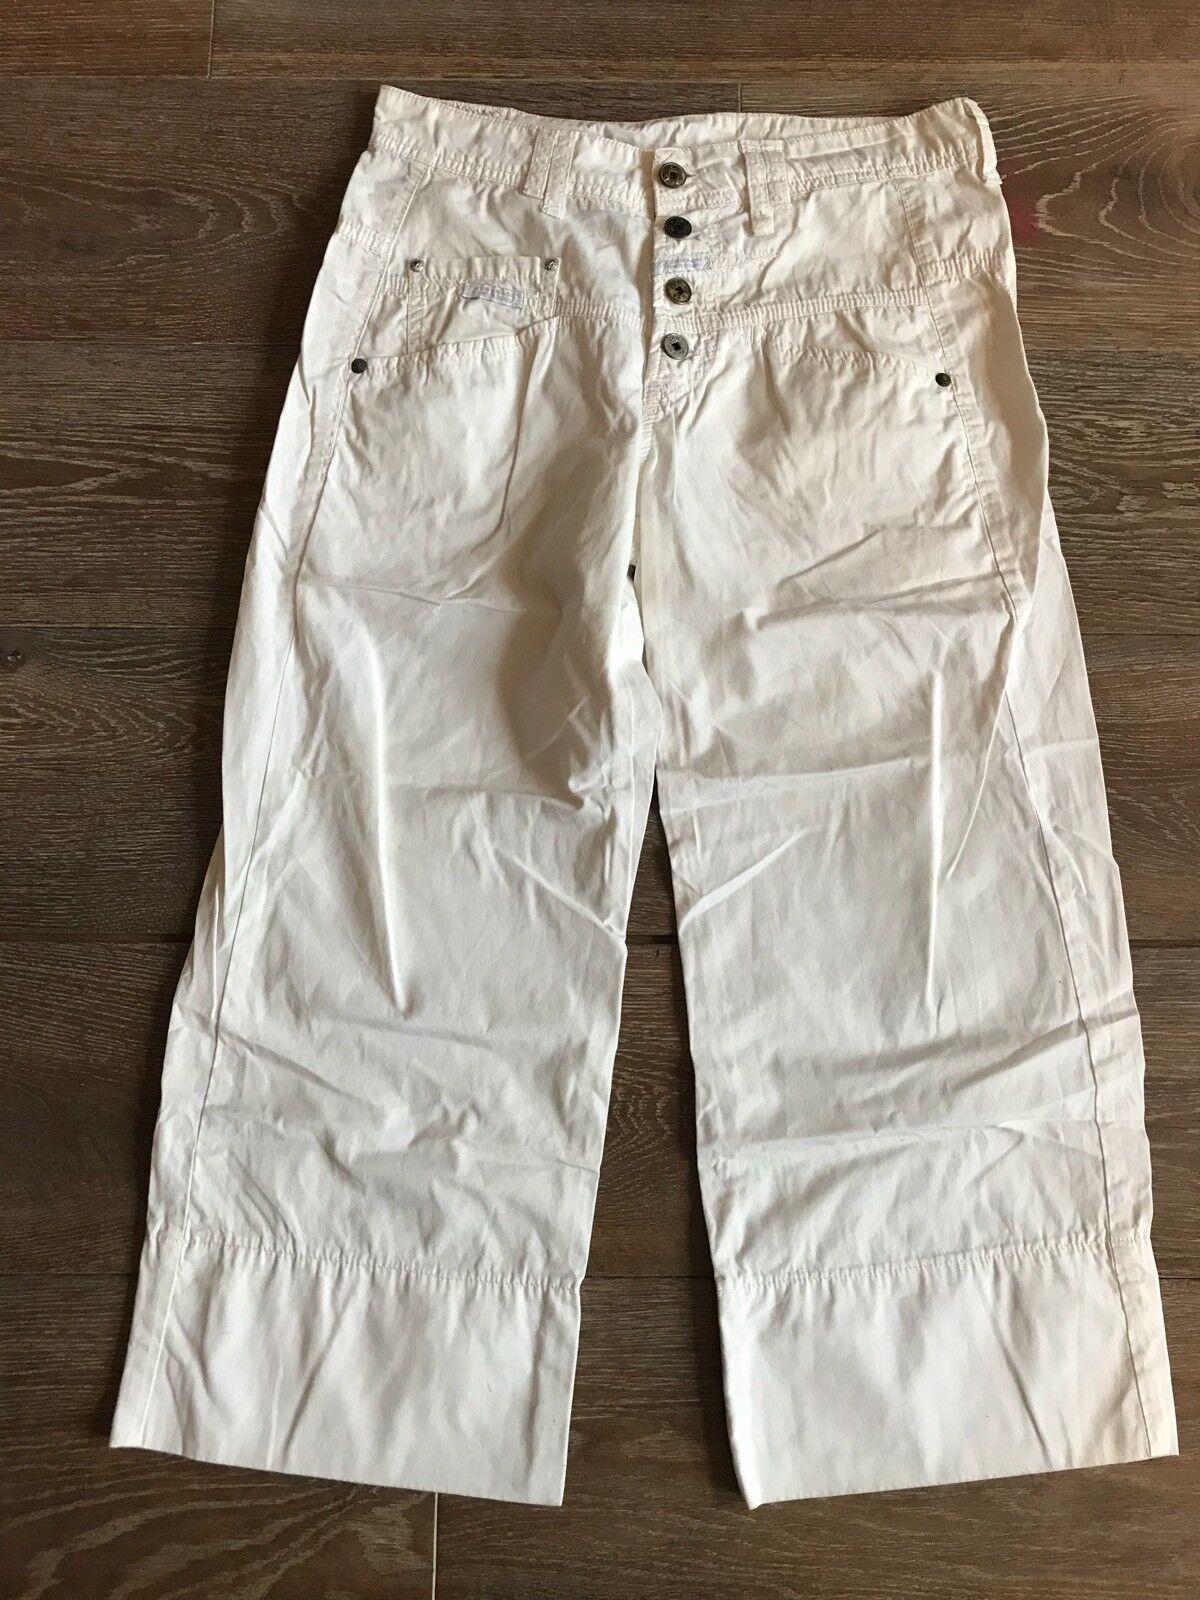 Marithe Francoise Girbaud 3 Quarter Length Cut Offs White Utility Trousers Fr 36